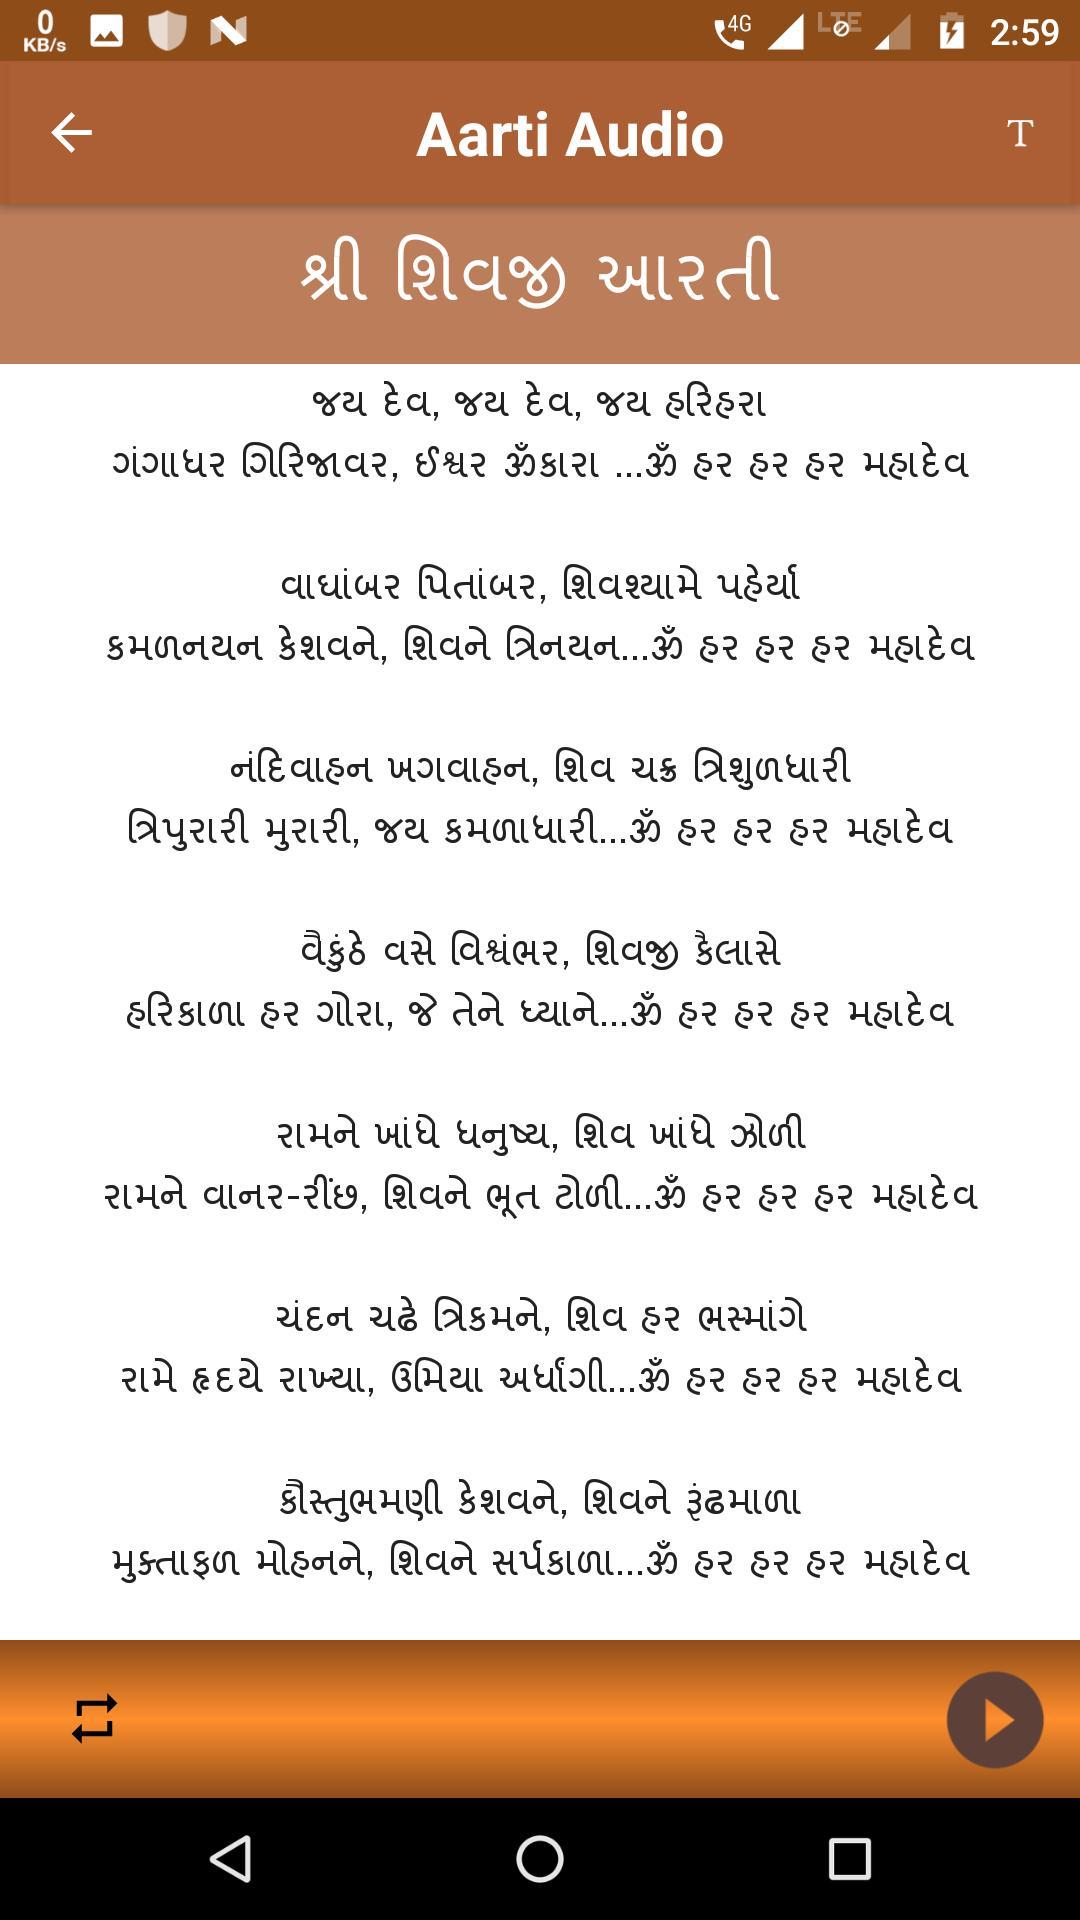 Aarti Sangrah Gujarati All Aarti Audio Lyrics For Android